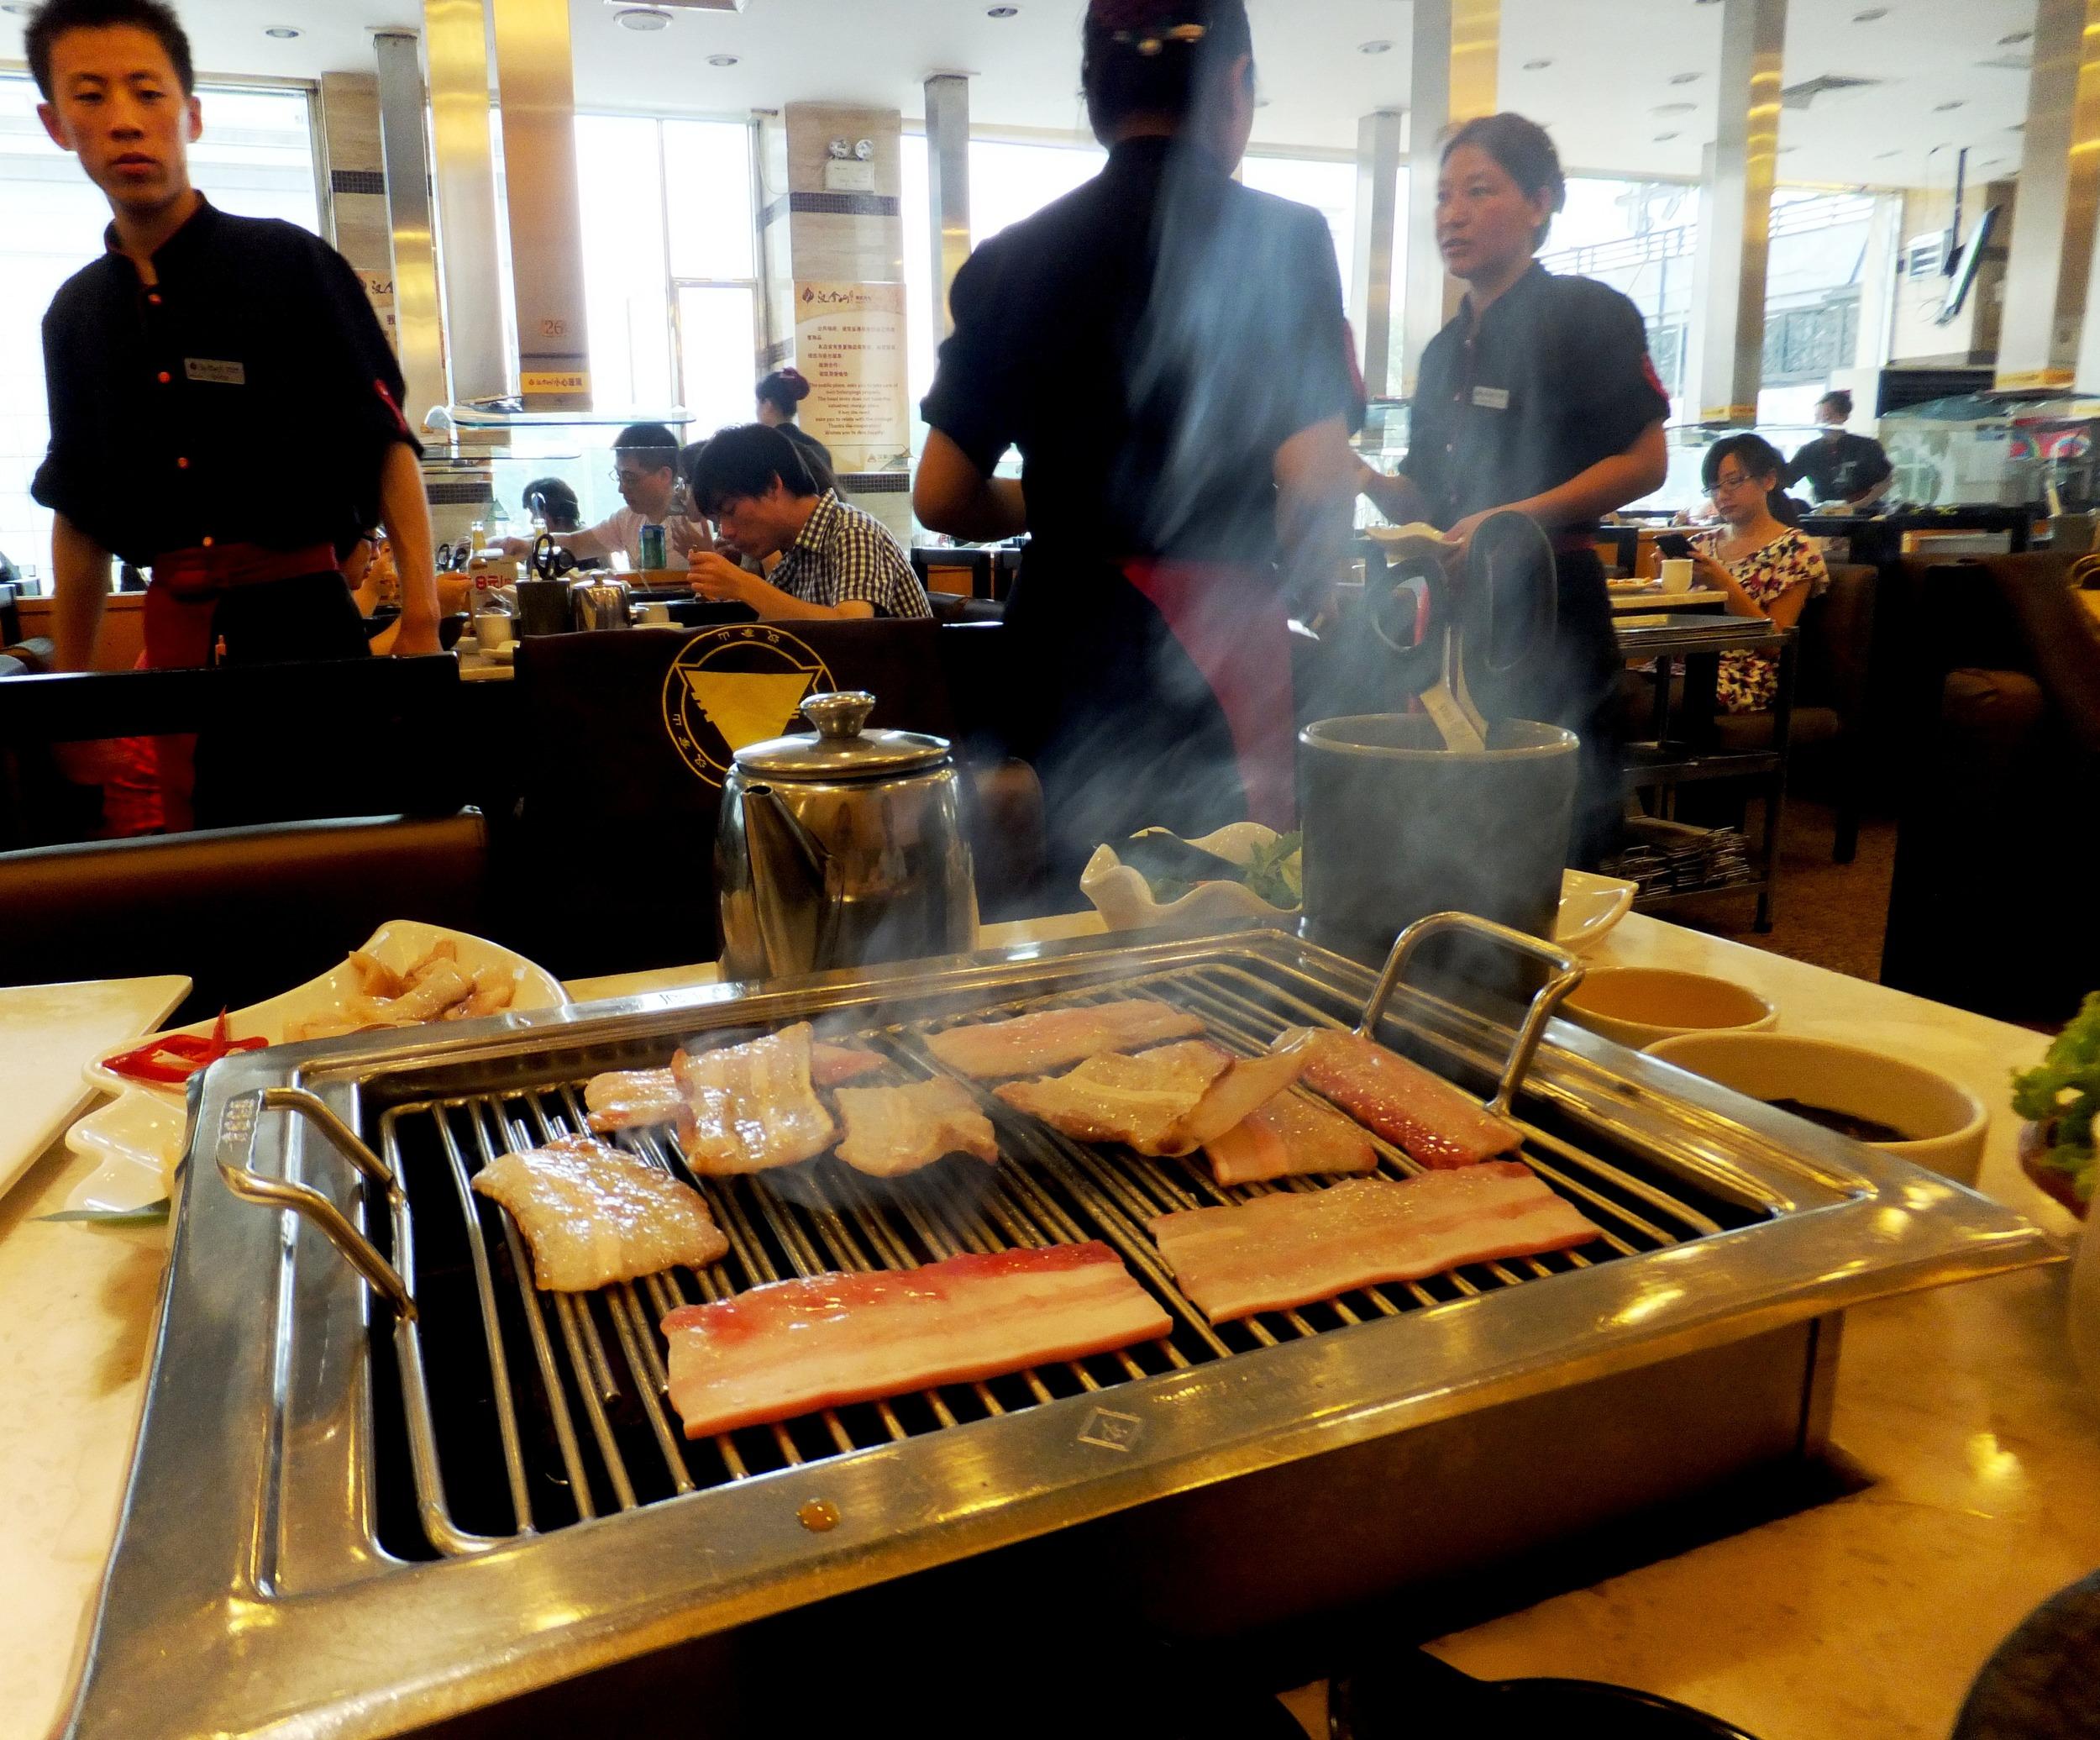 dscf6642-pork-belly-cooking.jpg